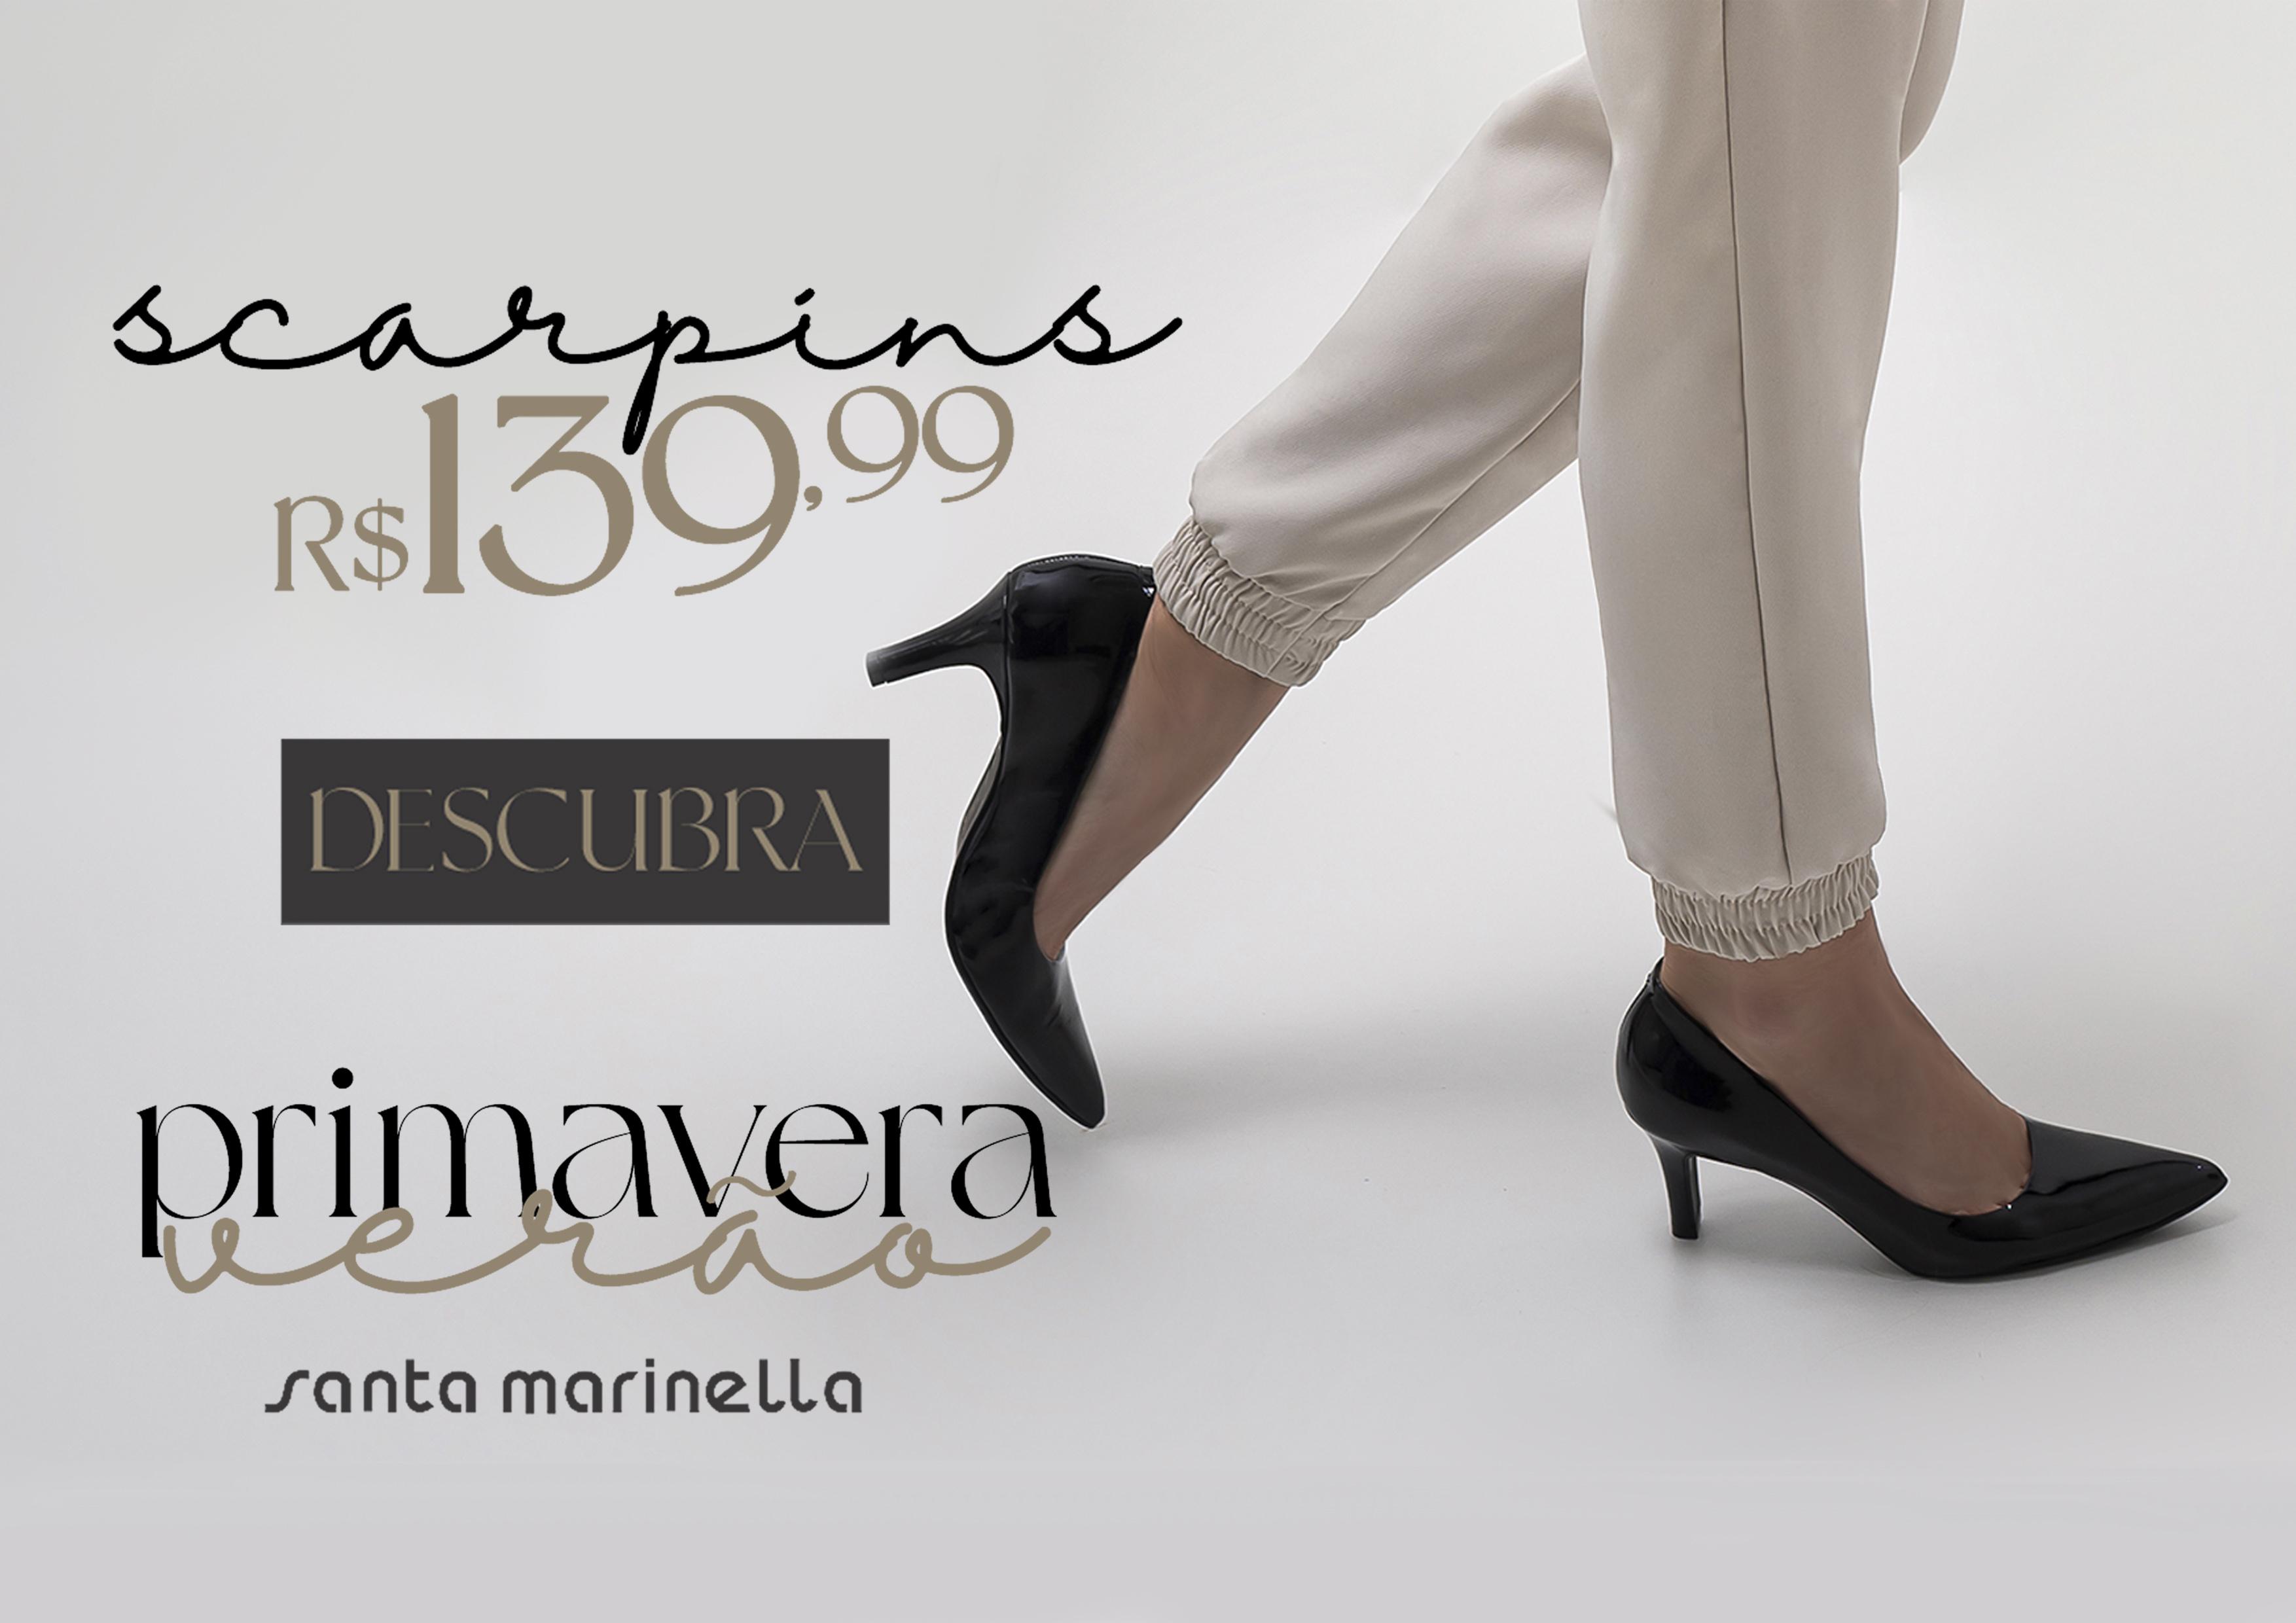 Primavera - verão 22 Scarpins por R$139,99 | Santa Marinella